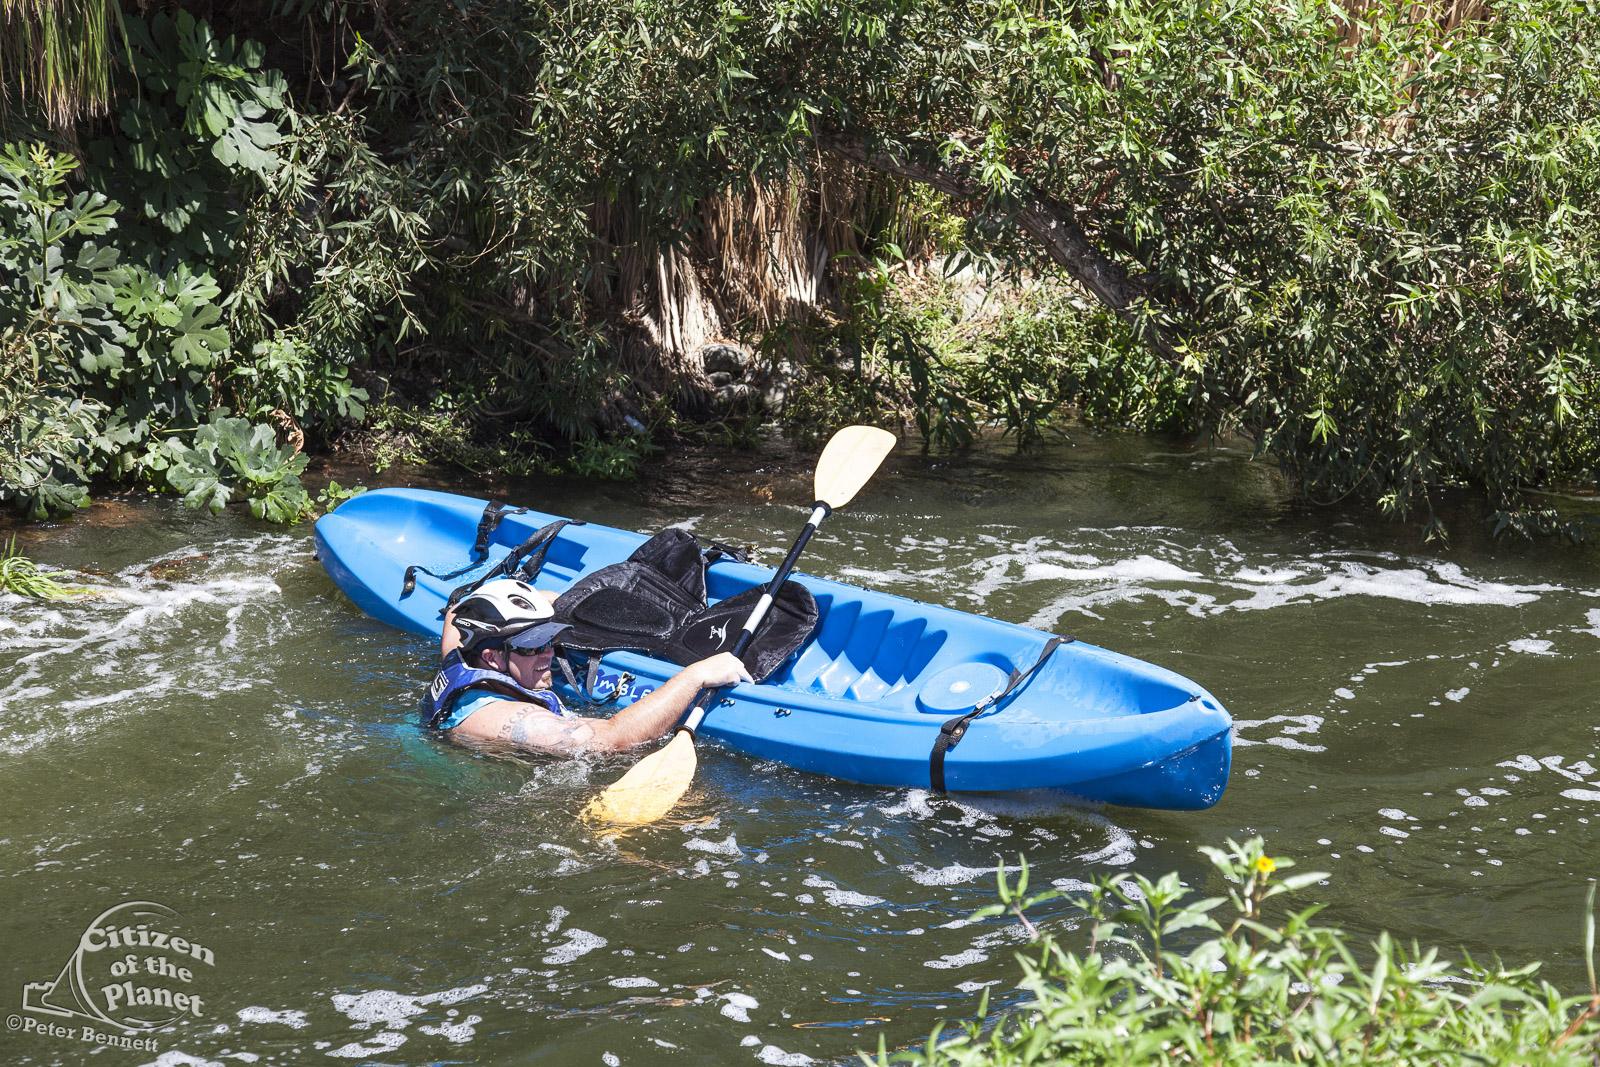 US_CA_48_3876_la_river_boat_race.jpg